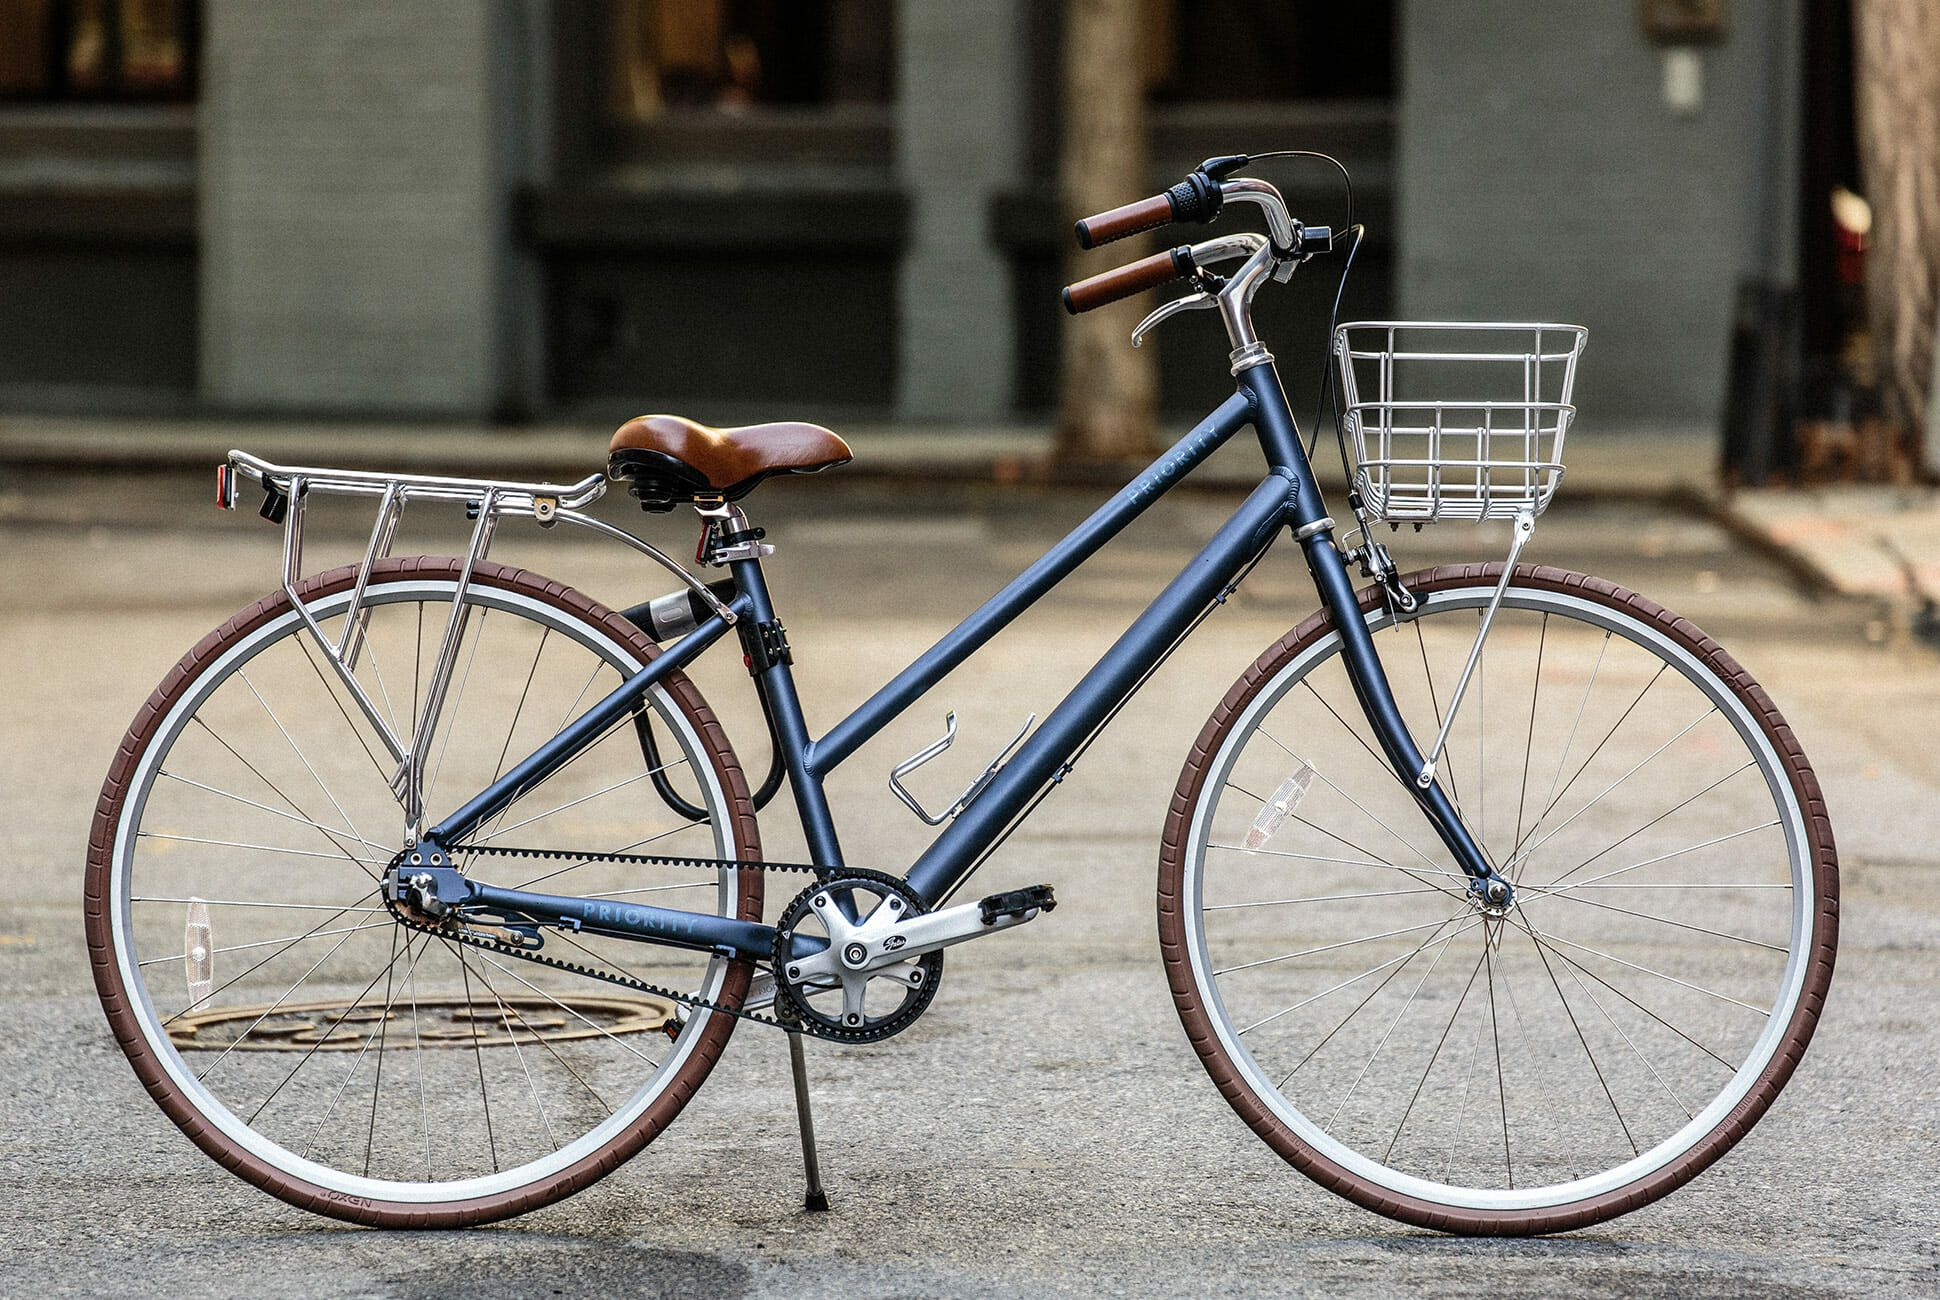 Priority-No-Maintenance-Bike-gear-patrol-slide-1